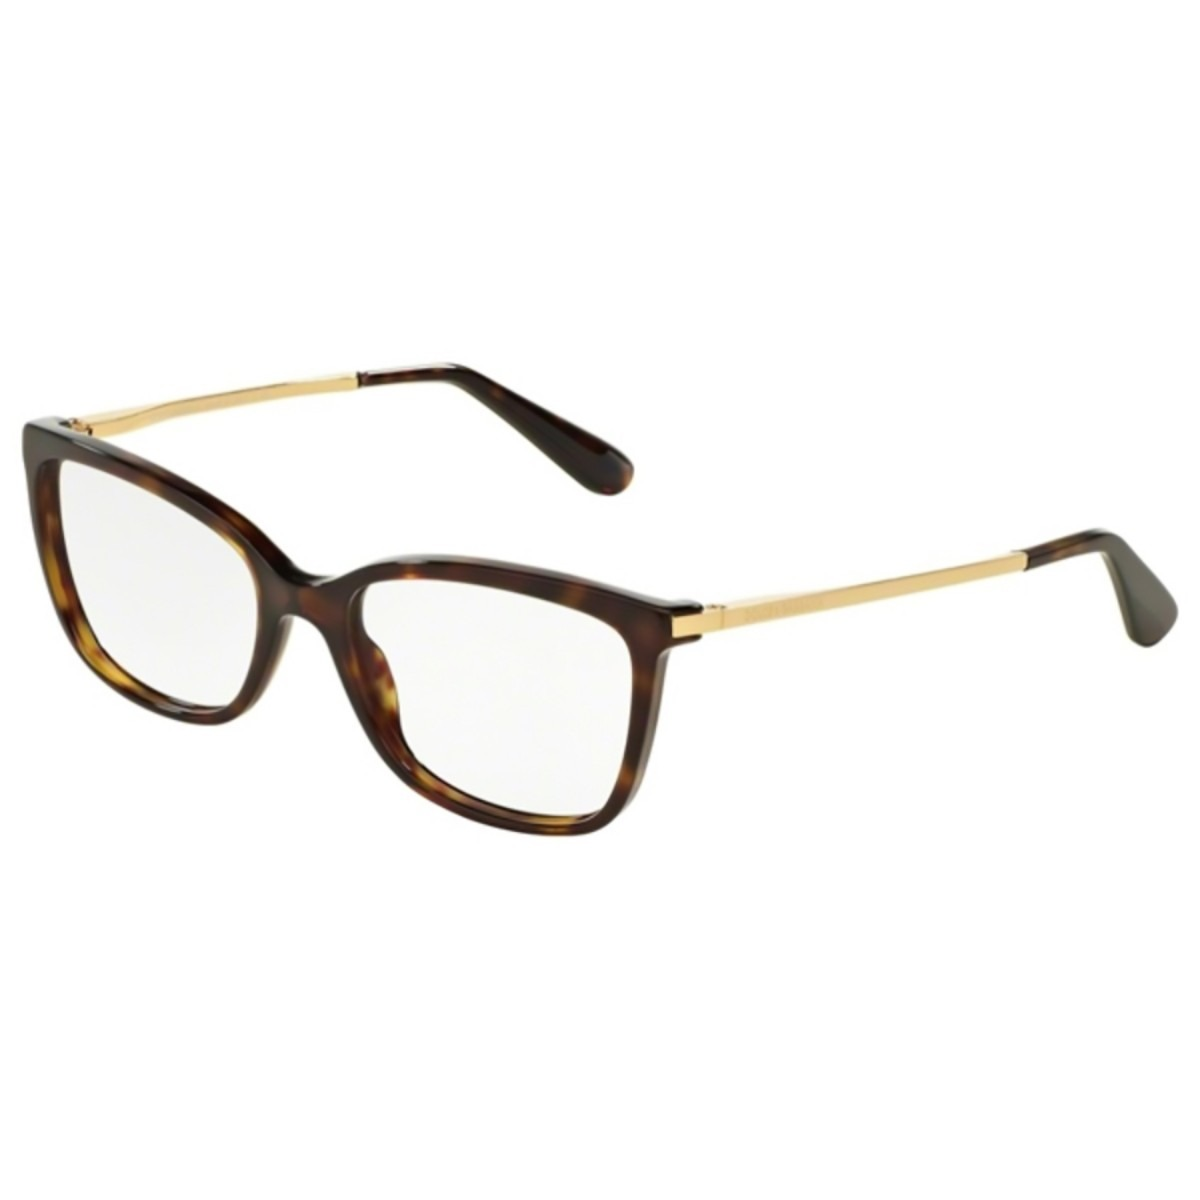 70d7eae685c63 Óculos De Grau Dolce   Gabbana Dg3243 502 - R  778